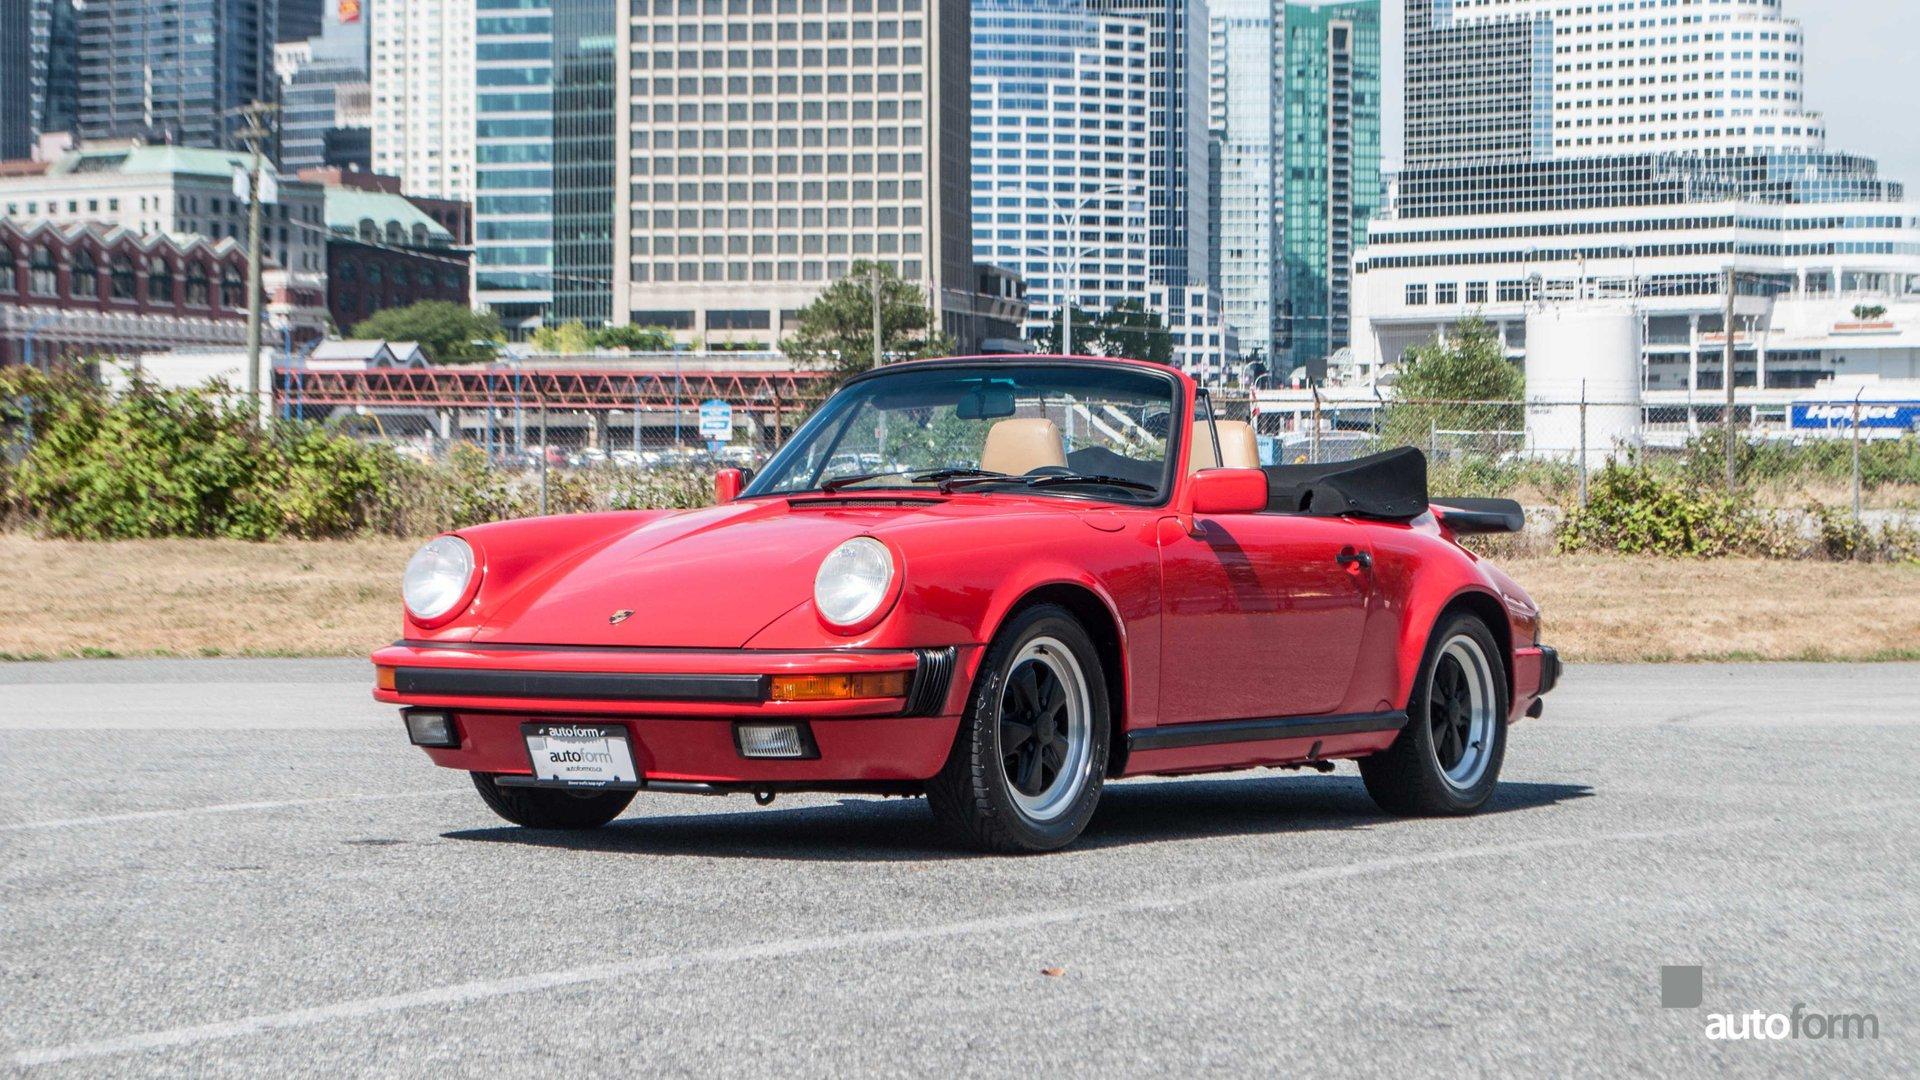 1989 porsche 911 carrera 2dr cabriolet